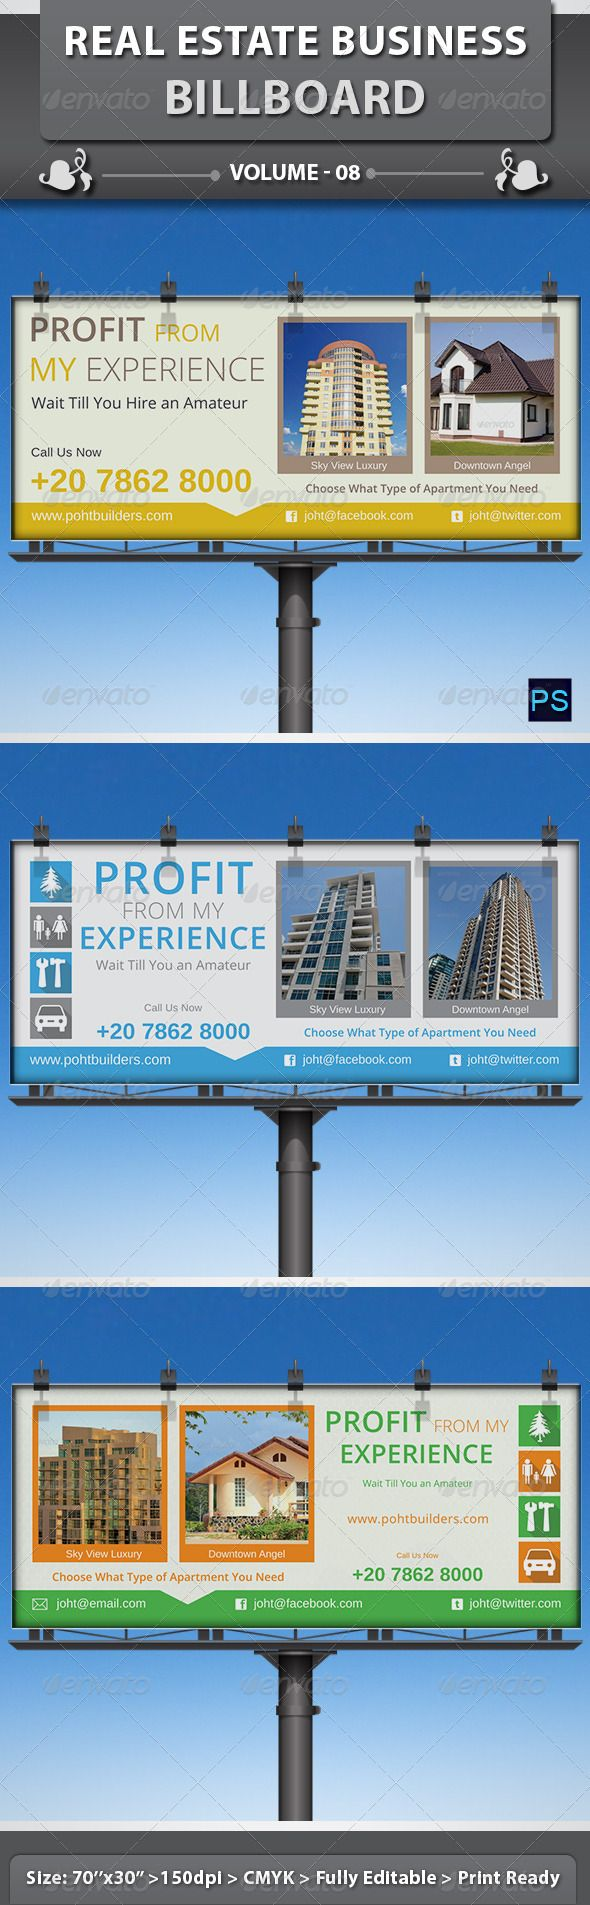 Real estate billboard design samples - Sofi Refinance Your Student Loans Pre Finance Your First Film Billboard Cool Billboards Pinterest Signage